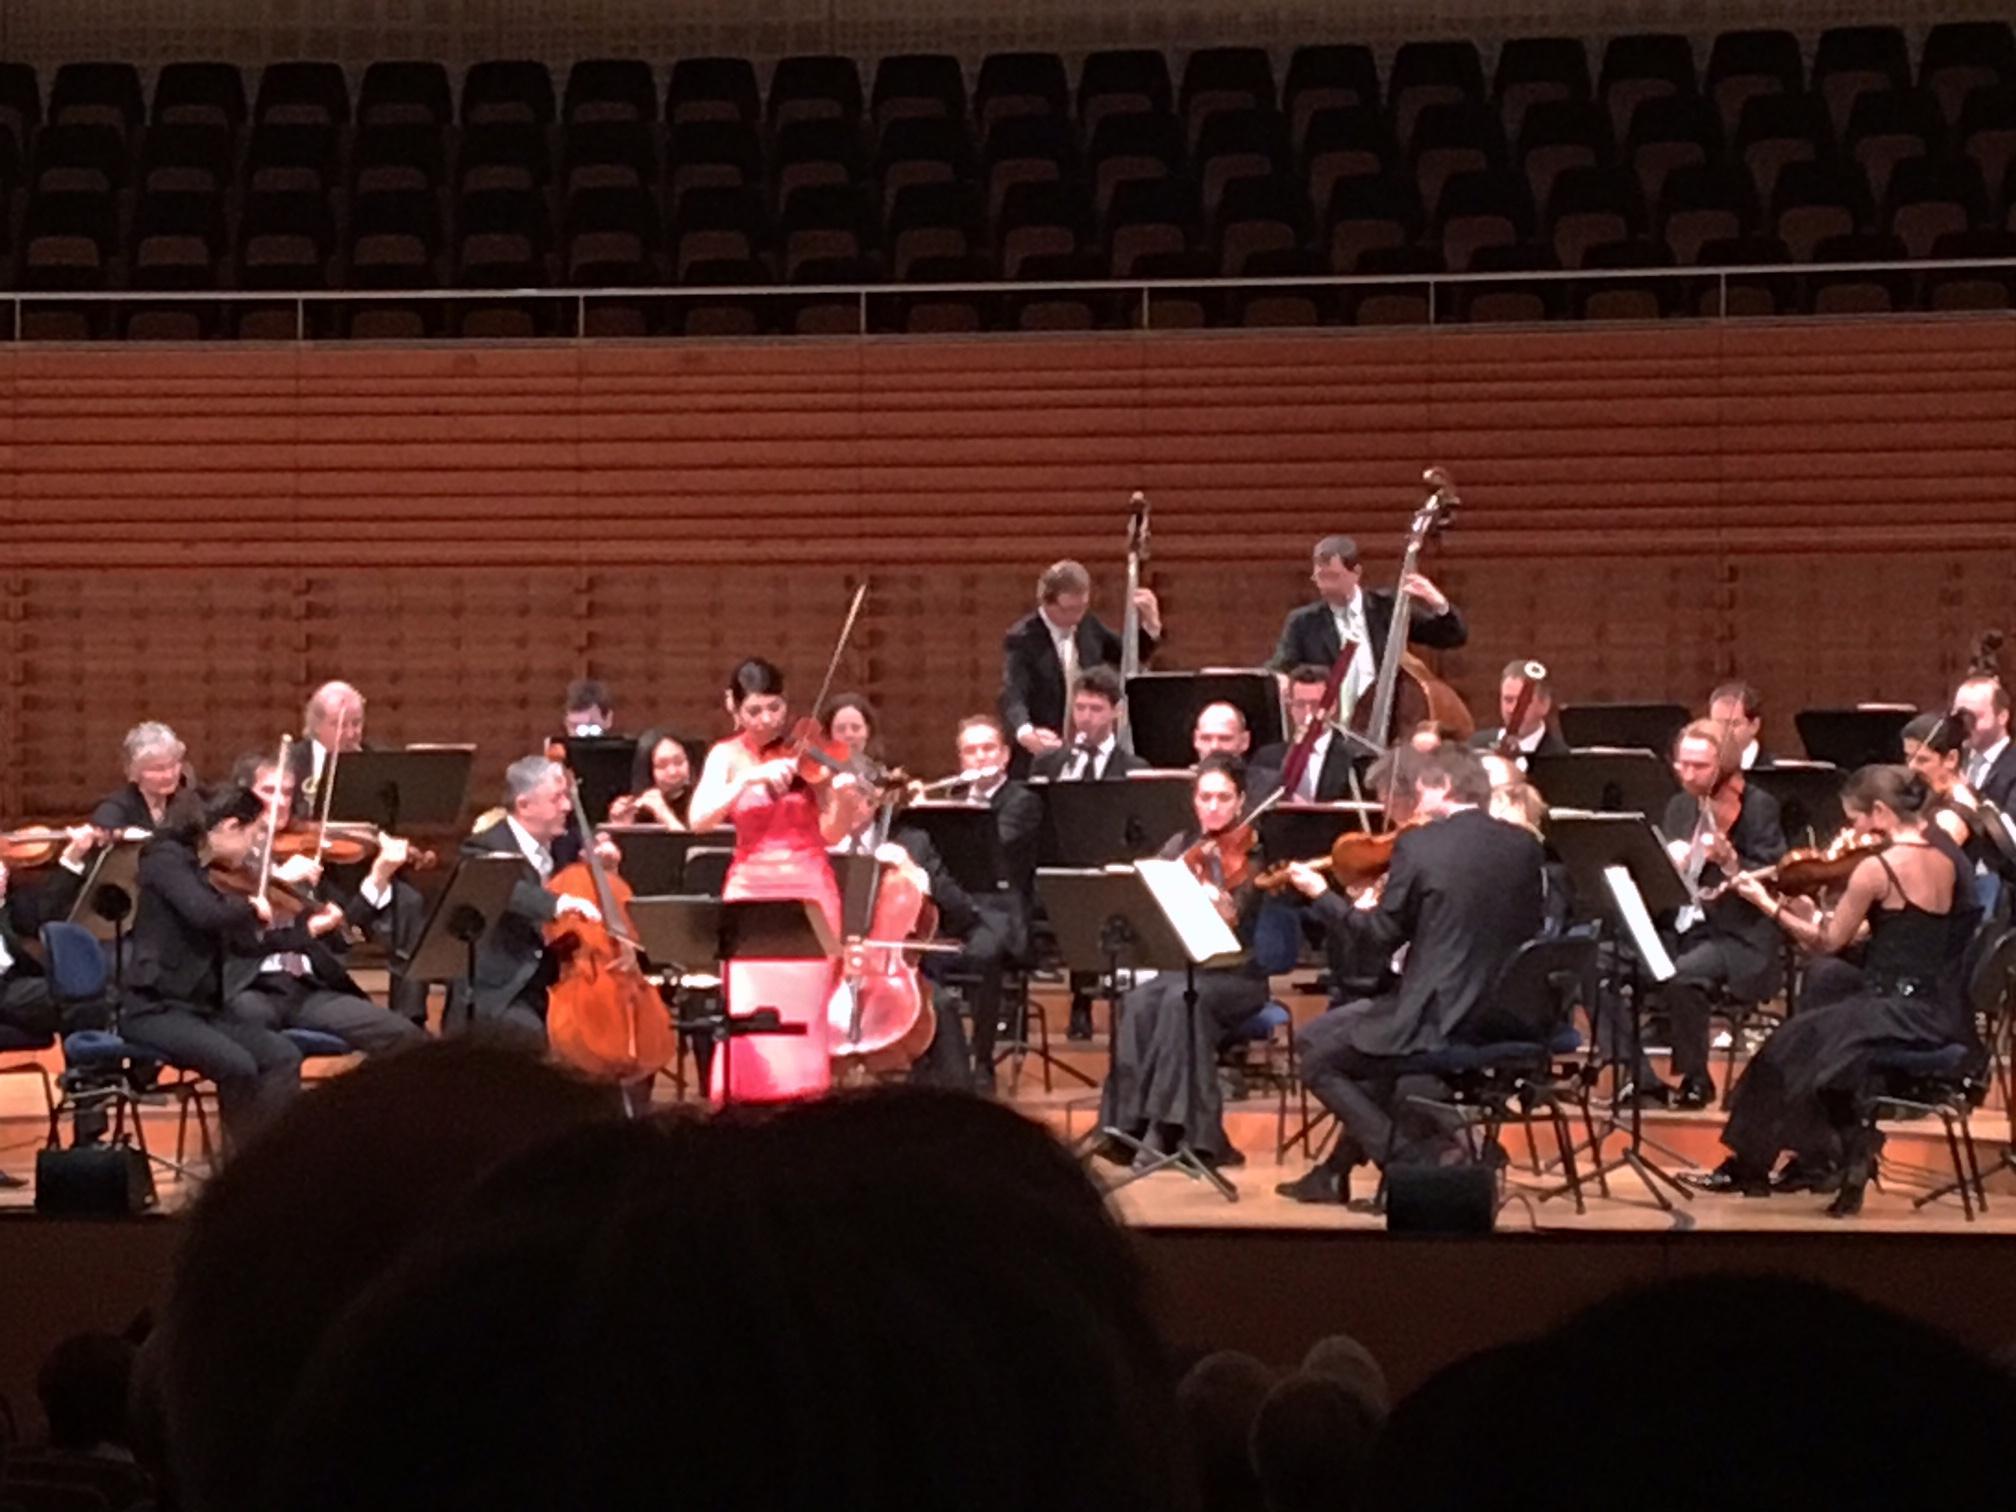 Das Orchester Camerata Salzburg im KKL Luzern.